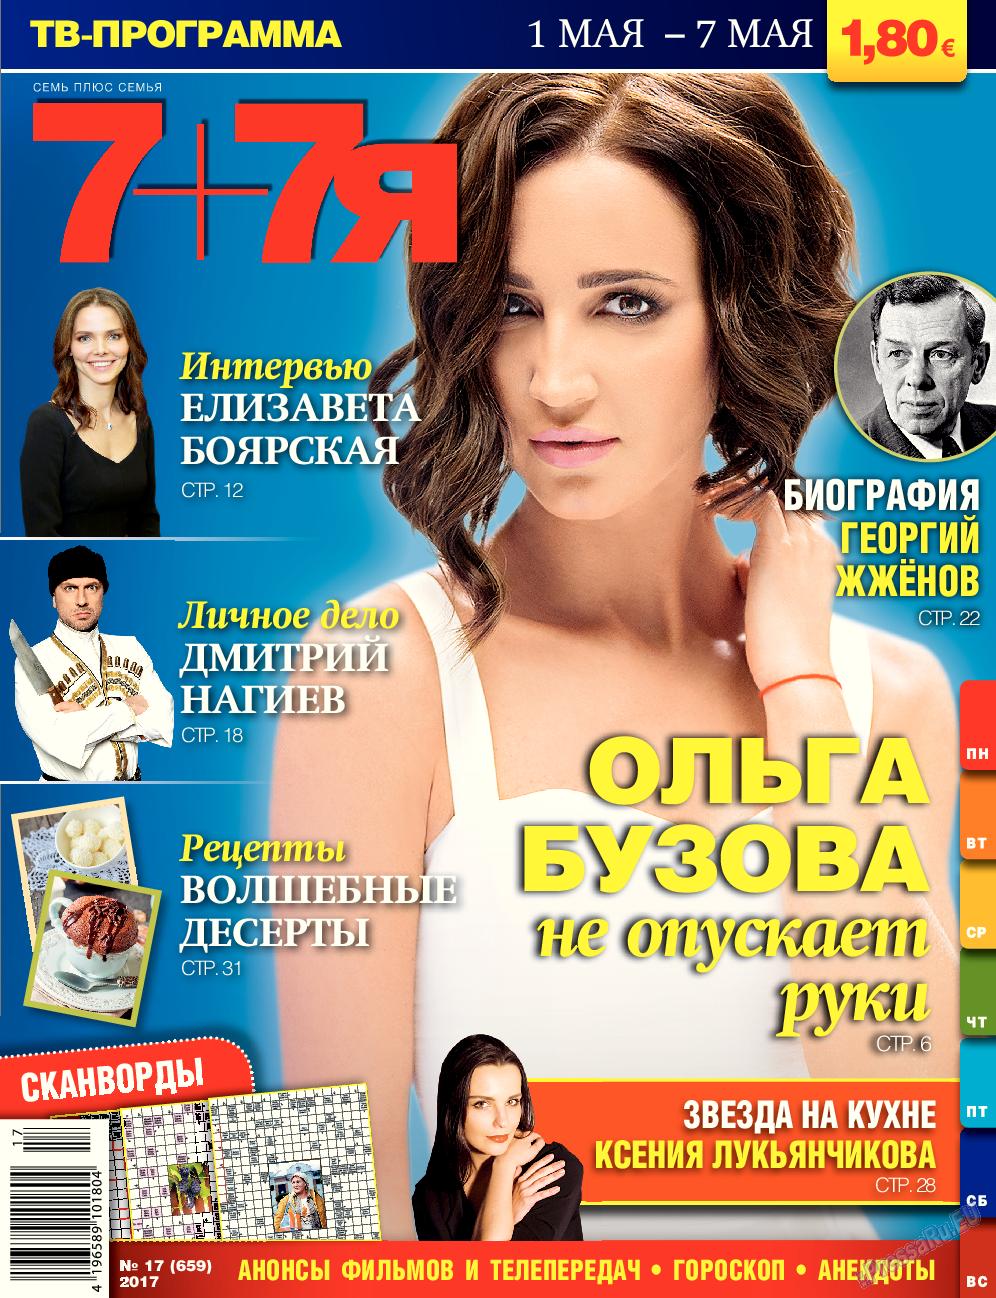 7плюс7я (журнал). 2017 год, номер 17, стр. 1